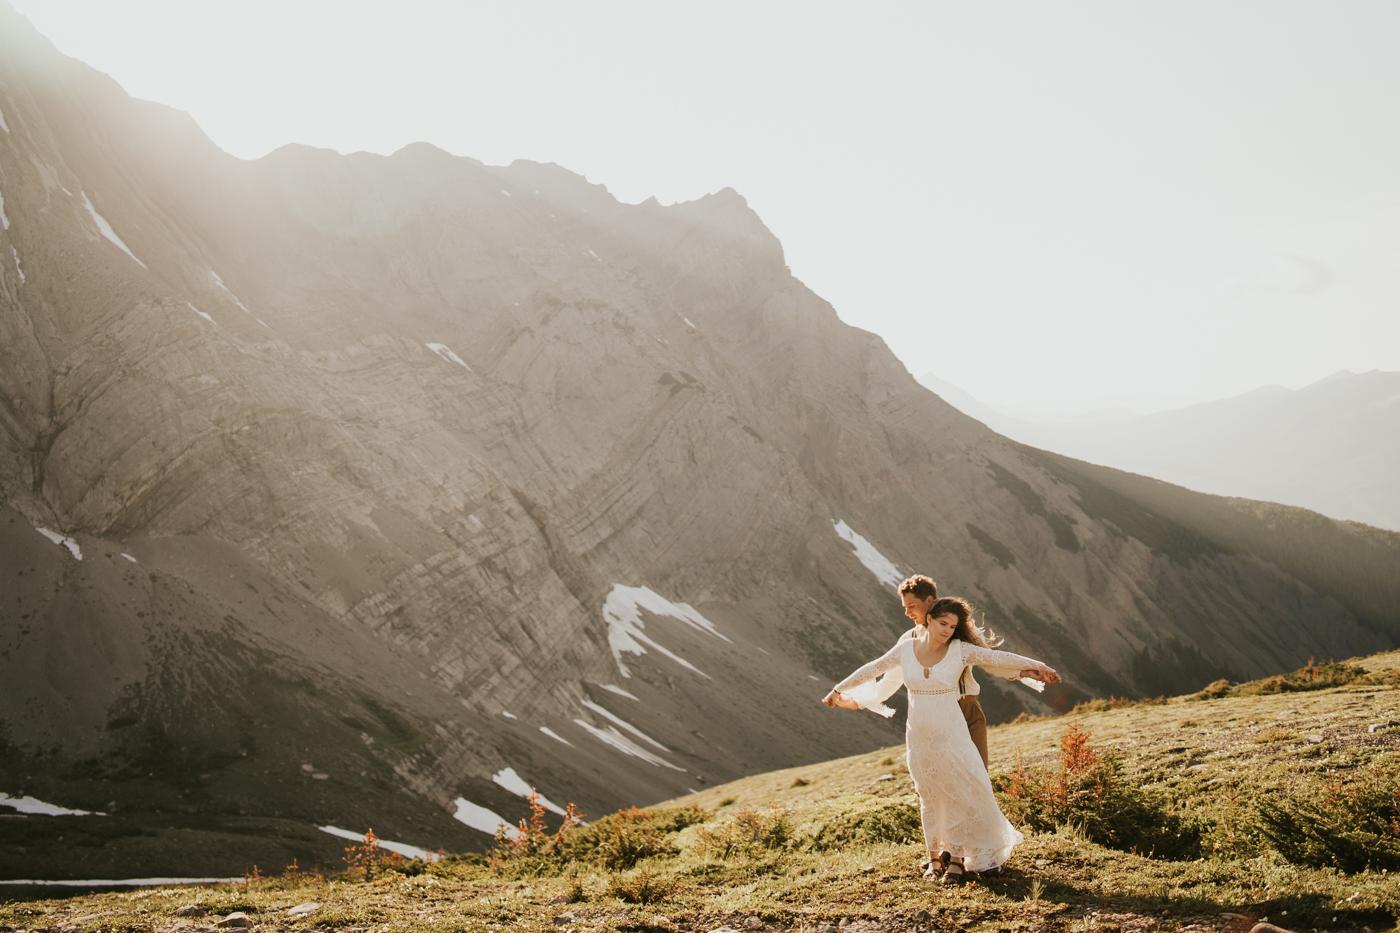 tyraephotography_photographer_wedding_elopement_engagement_photography-08514.jpg